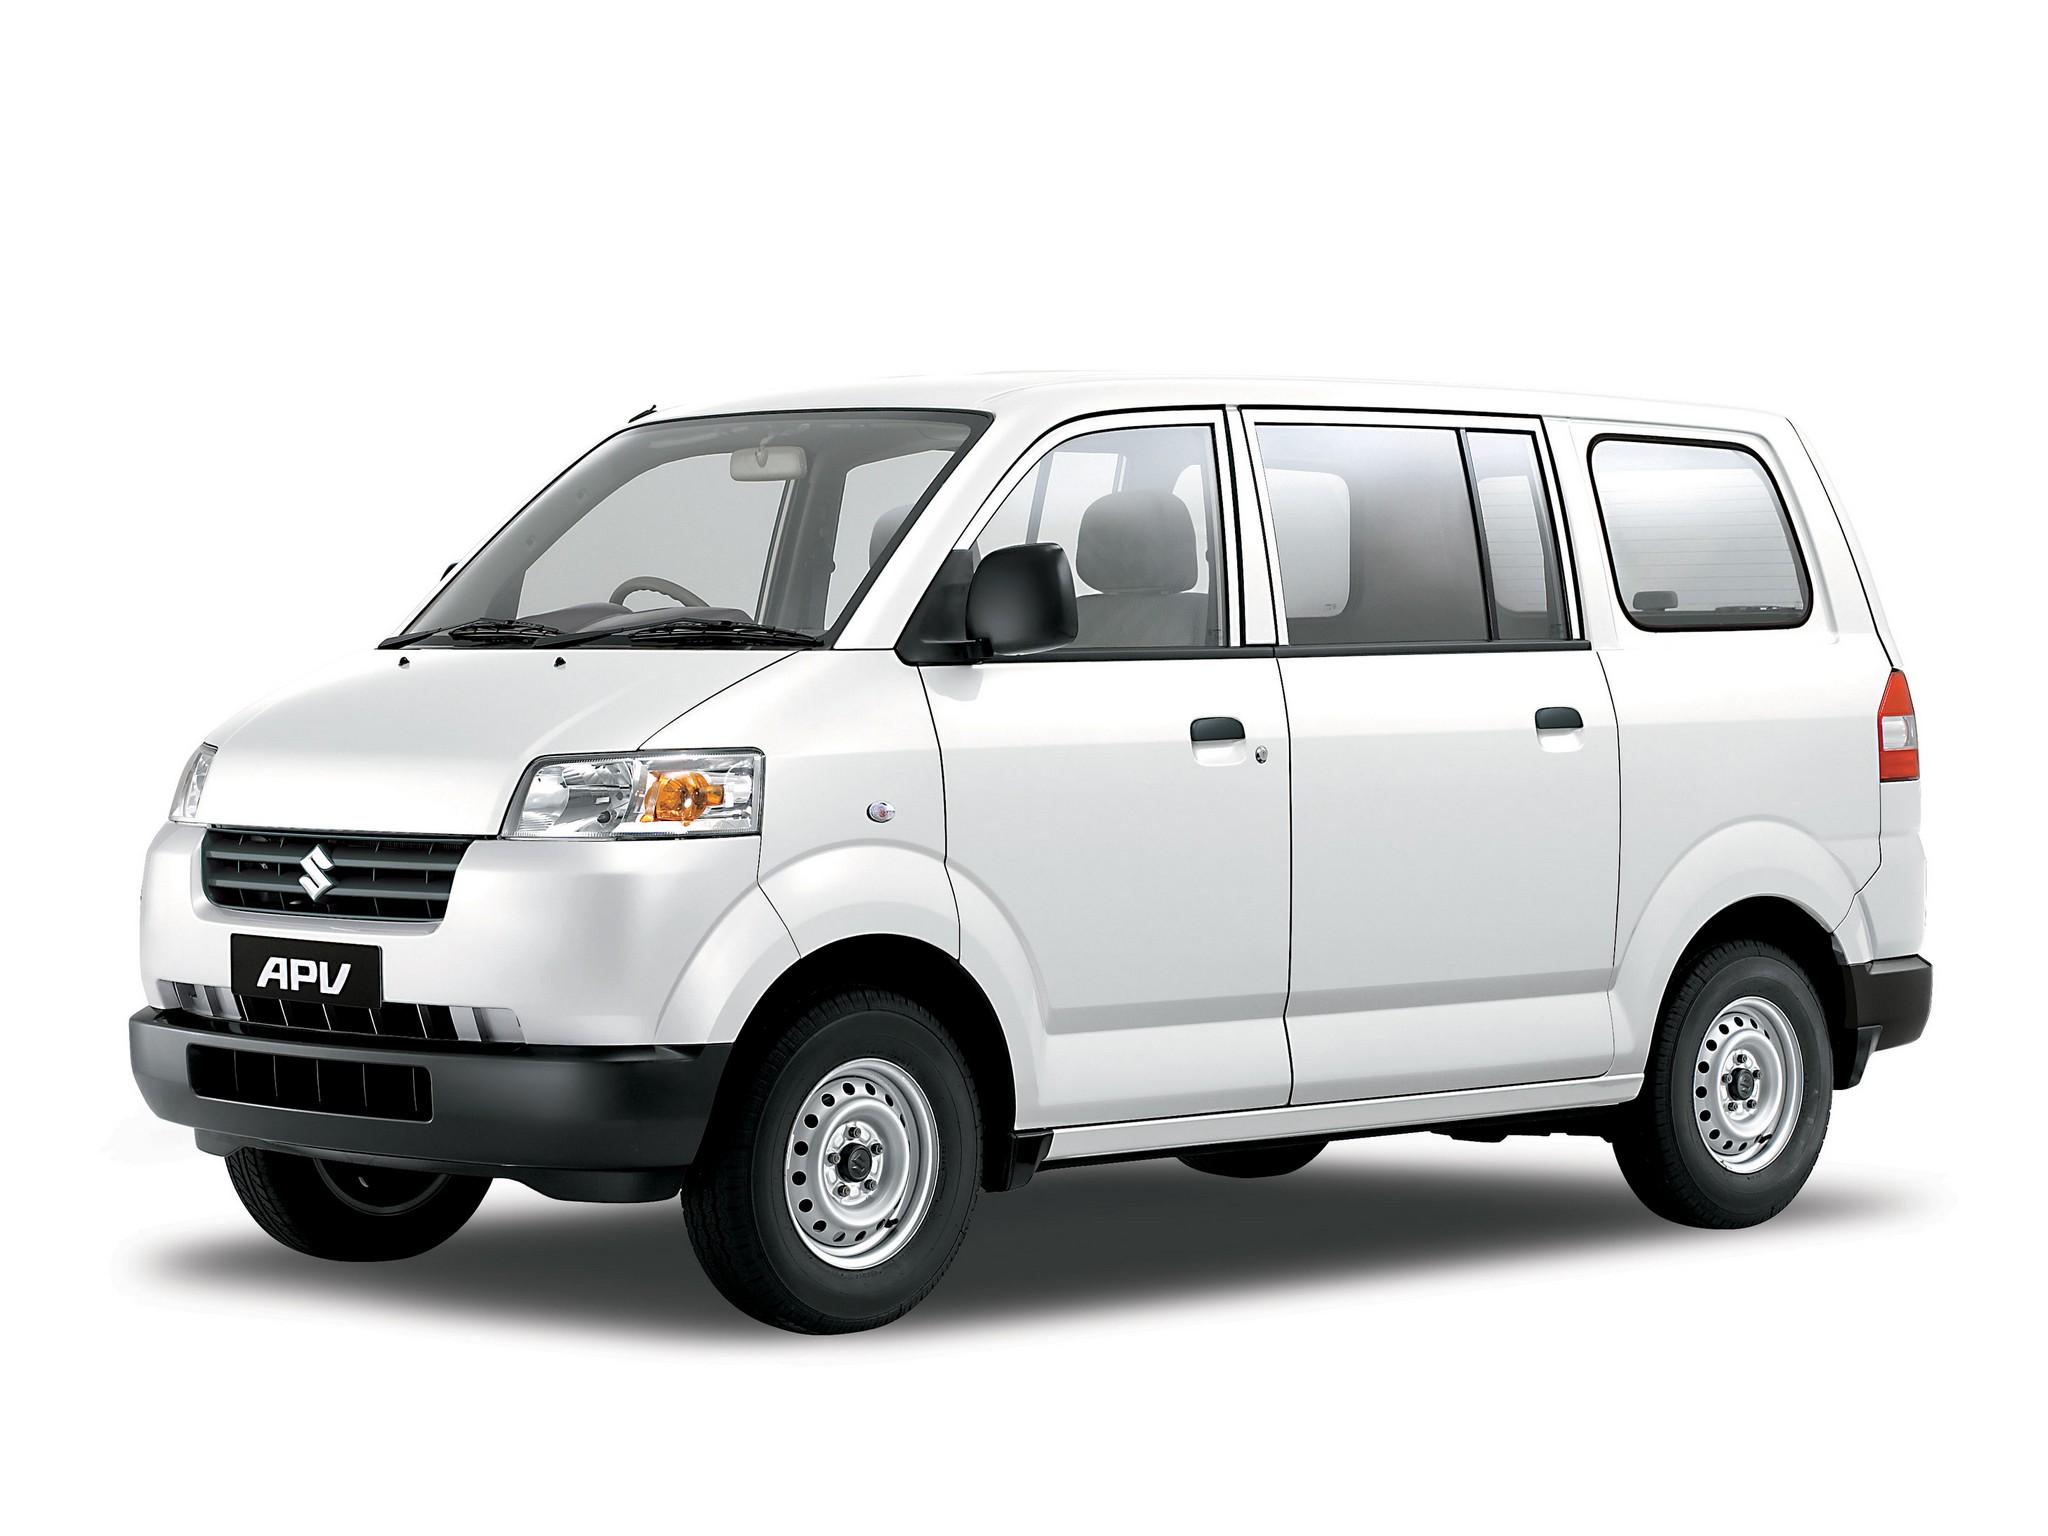 Suzuki apv specs